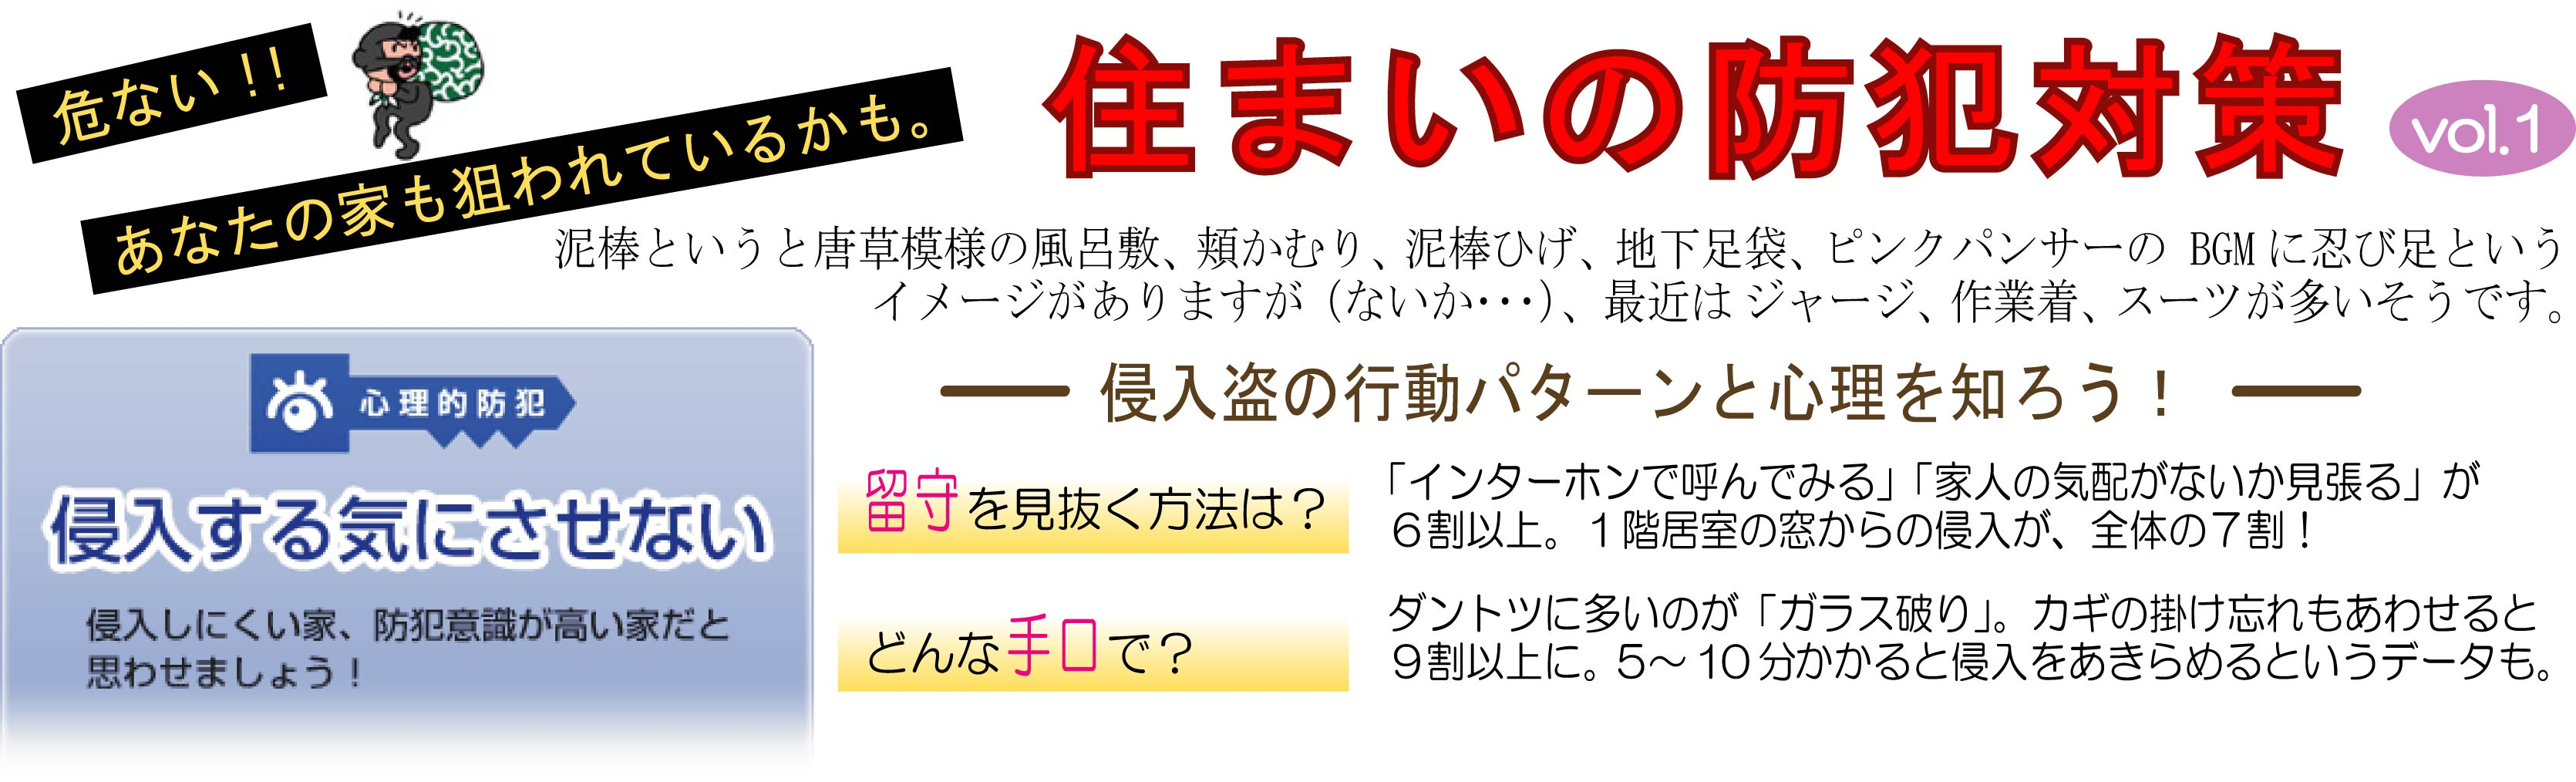 KuraSi-natu-sin72-11.jpg